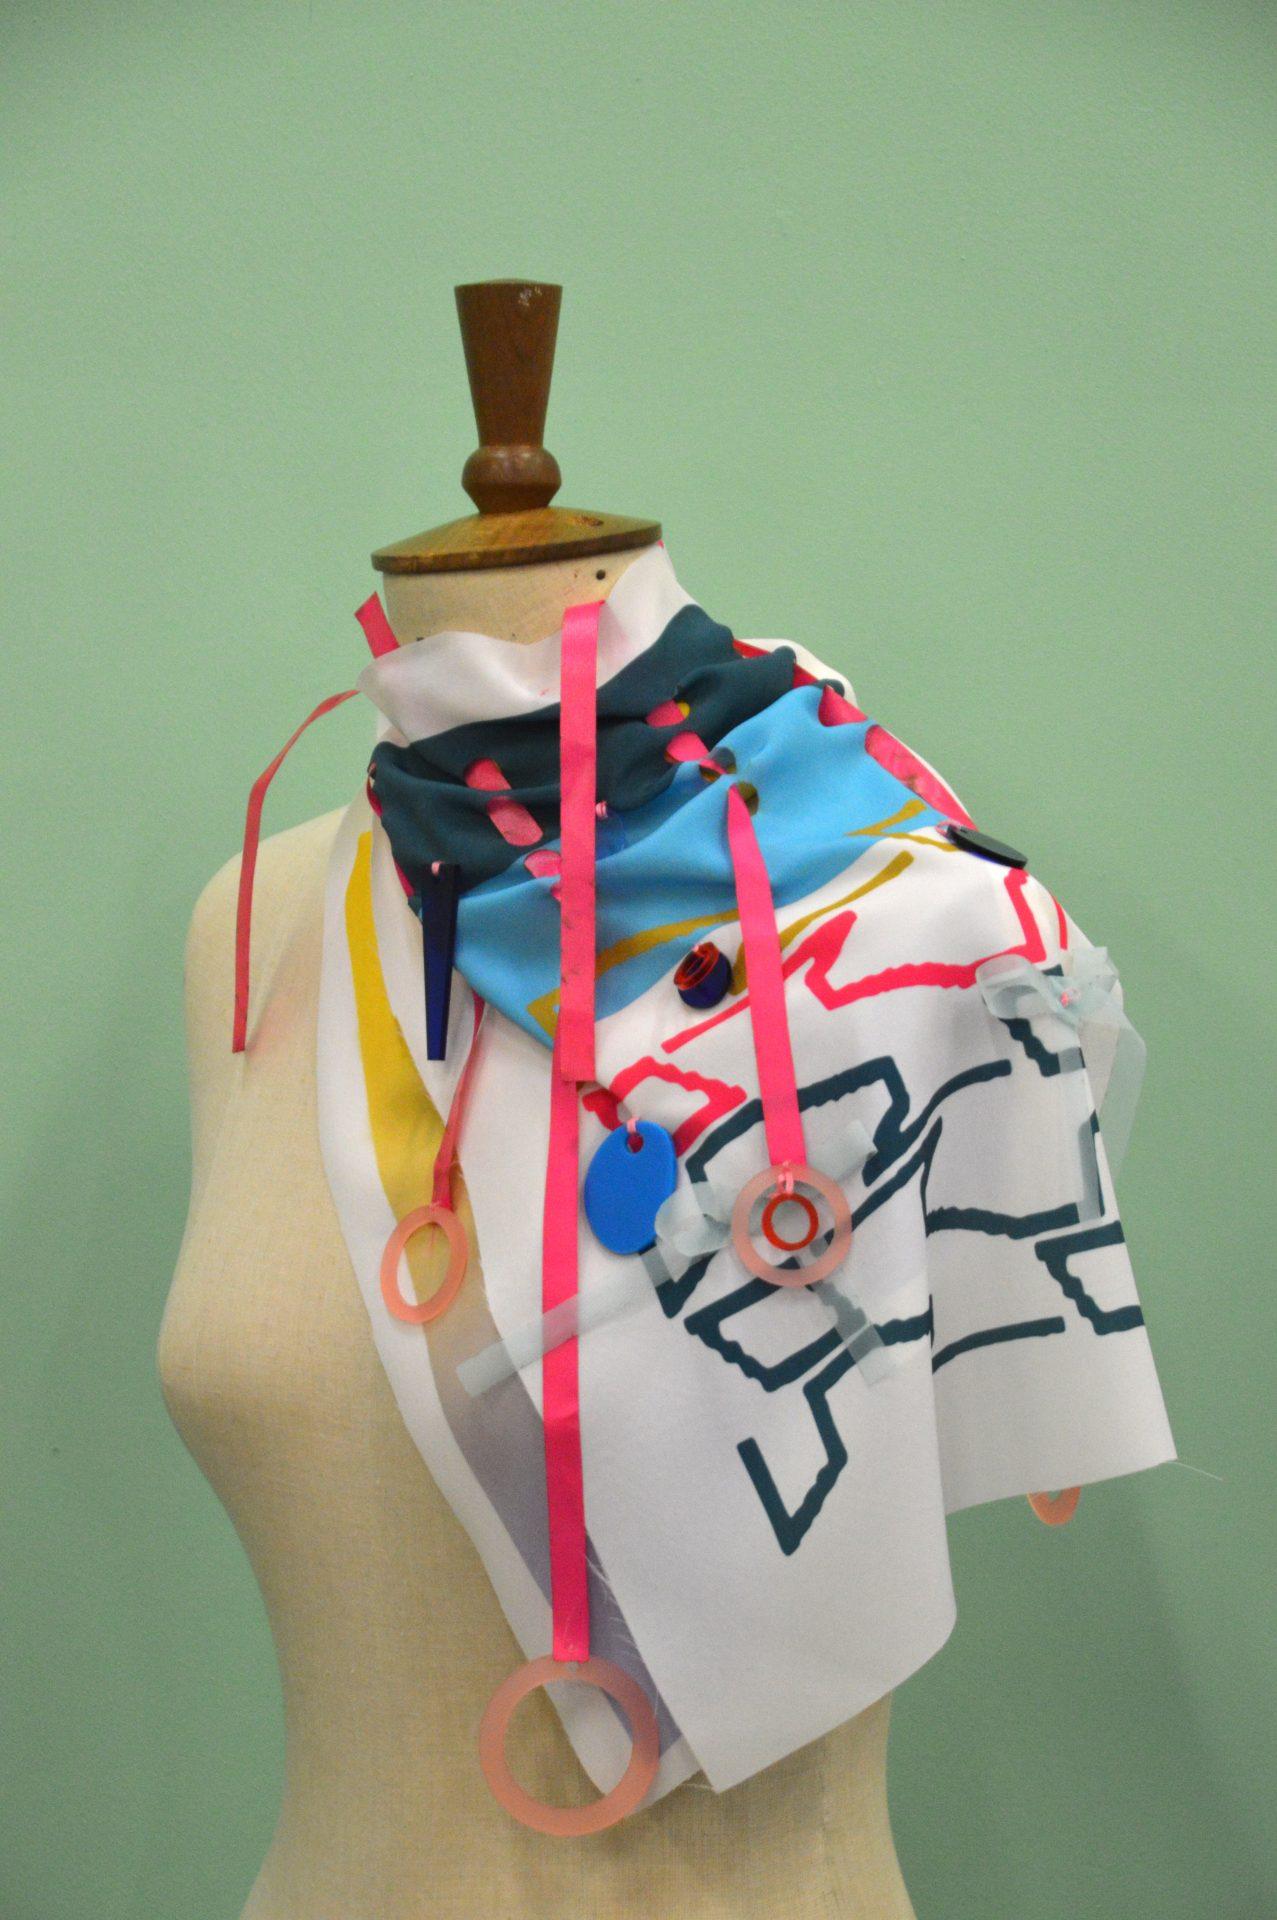 Textile piece made in a masterclass.